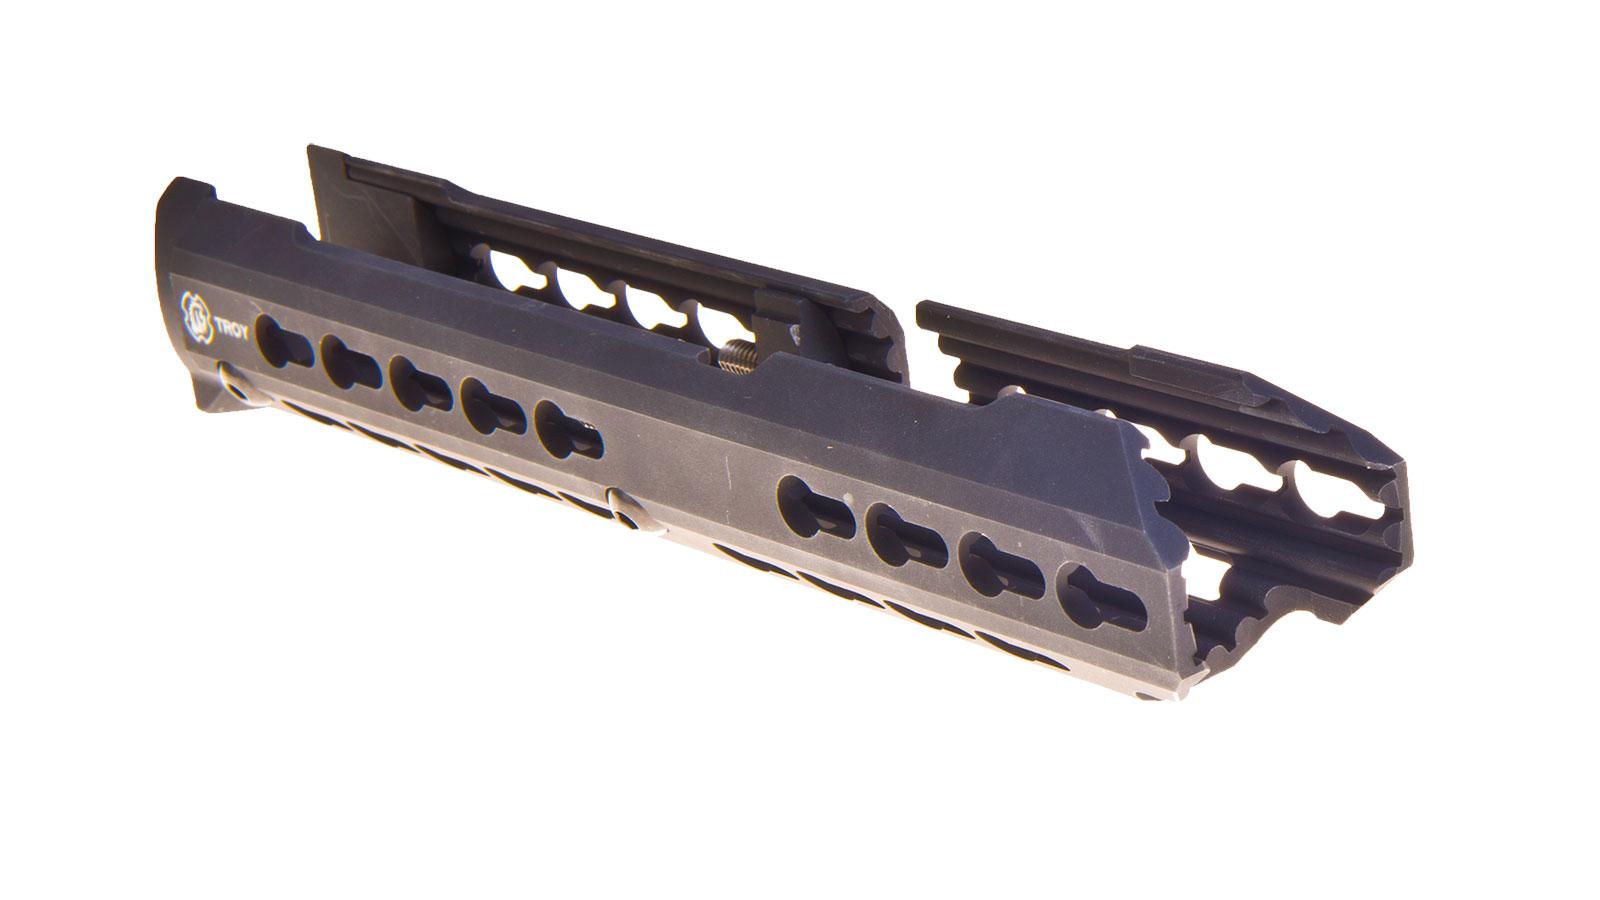 Troy SRAIAKKSBBT00 BattleRail AK47